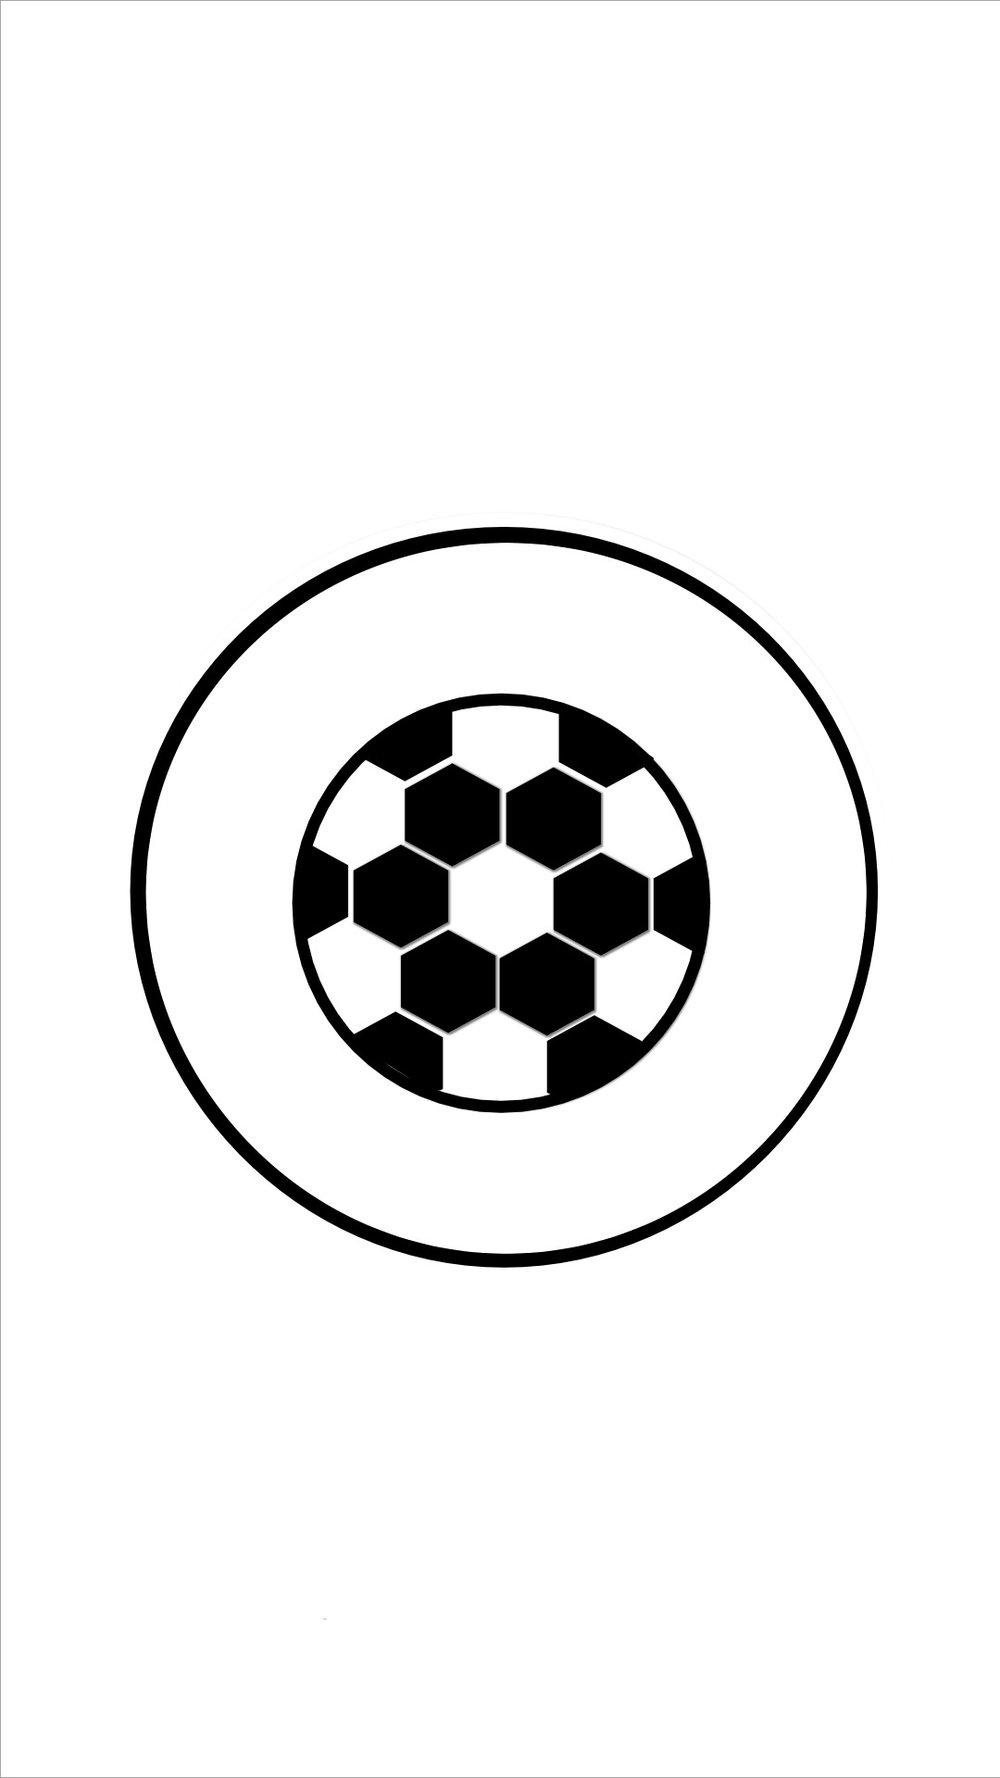 Instagram-cover-ball-blackwhite-lotnotes.com.jpg